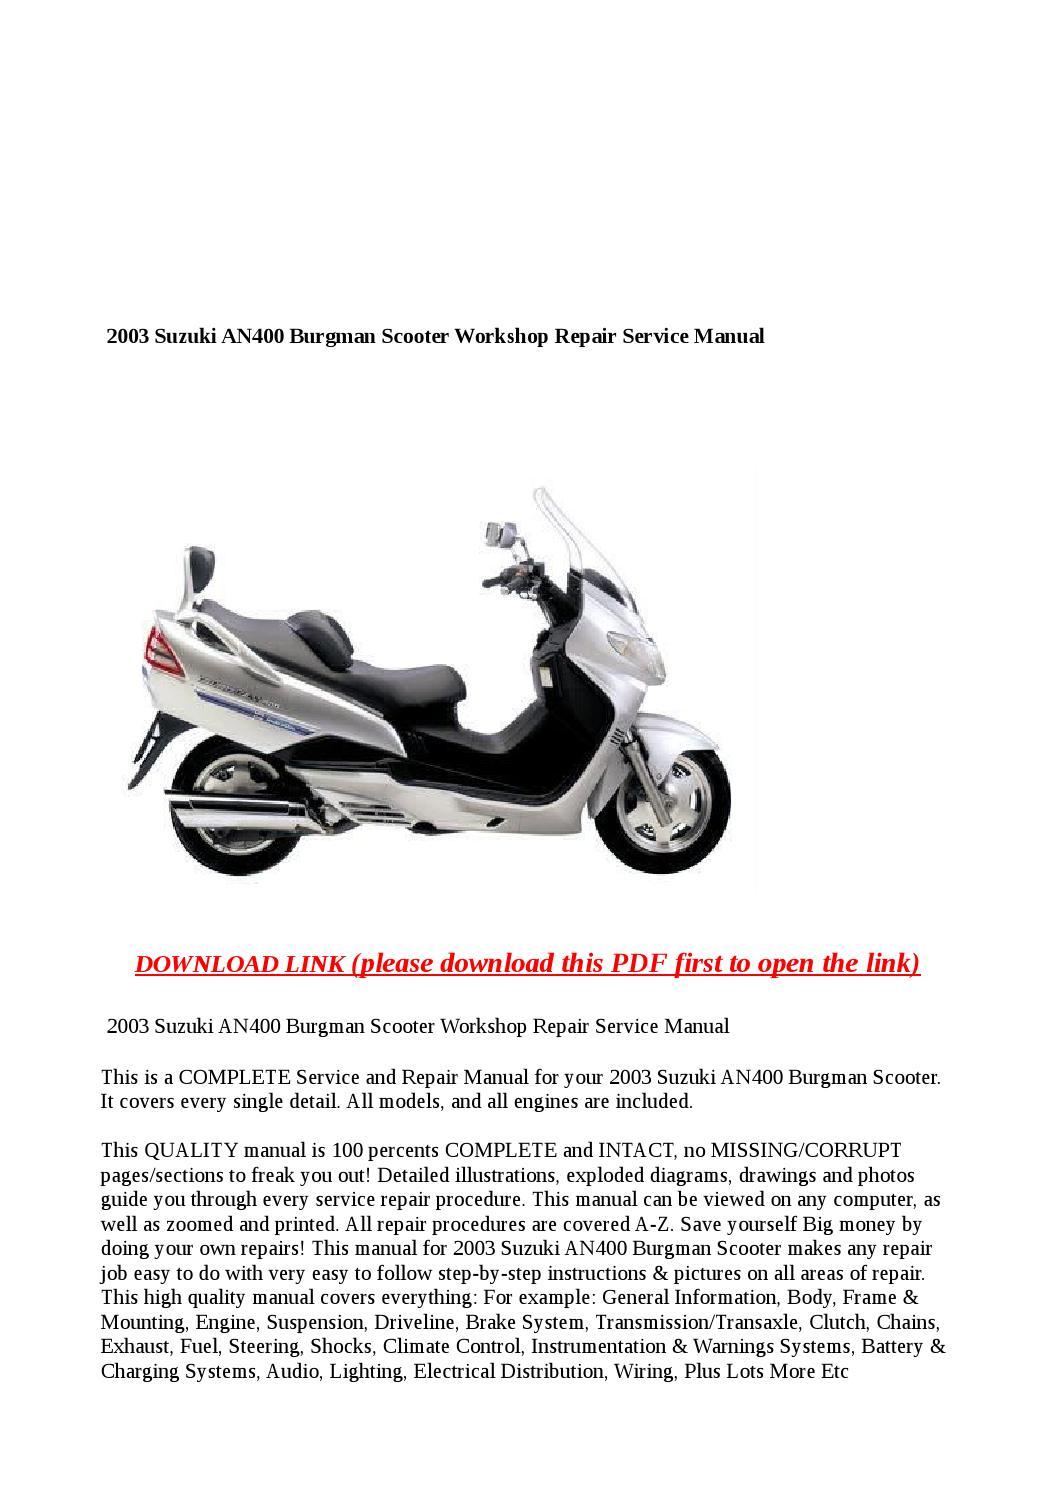 2003 Suzuki An400 Burgman Scooter Workshop Repair Service Manual By Greace Clark